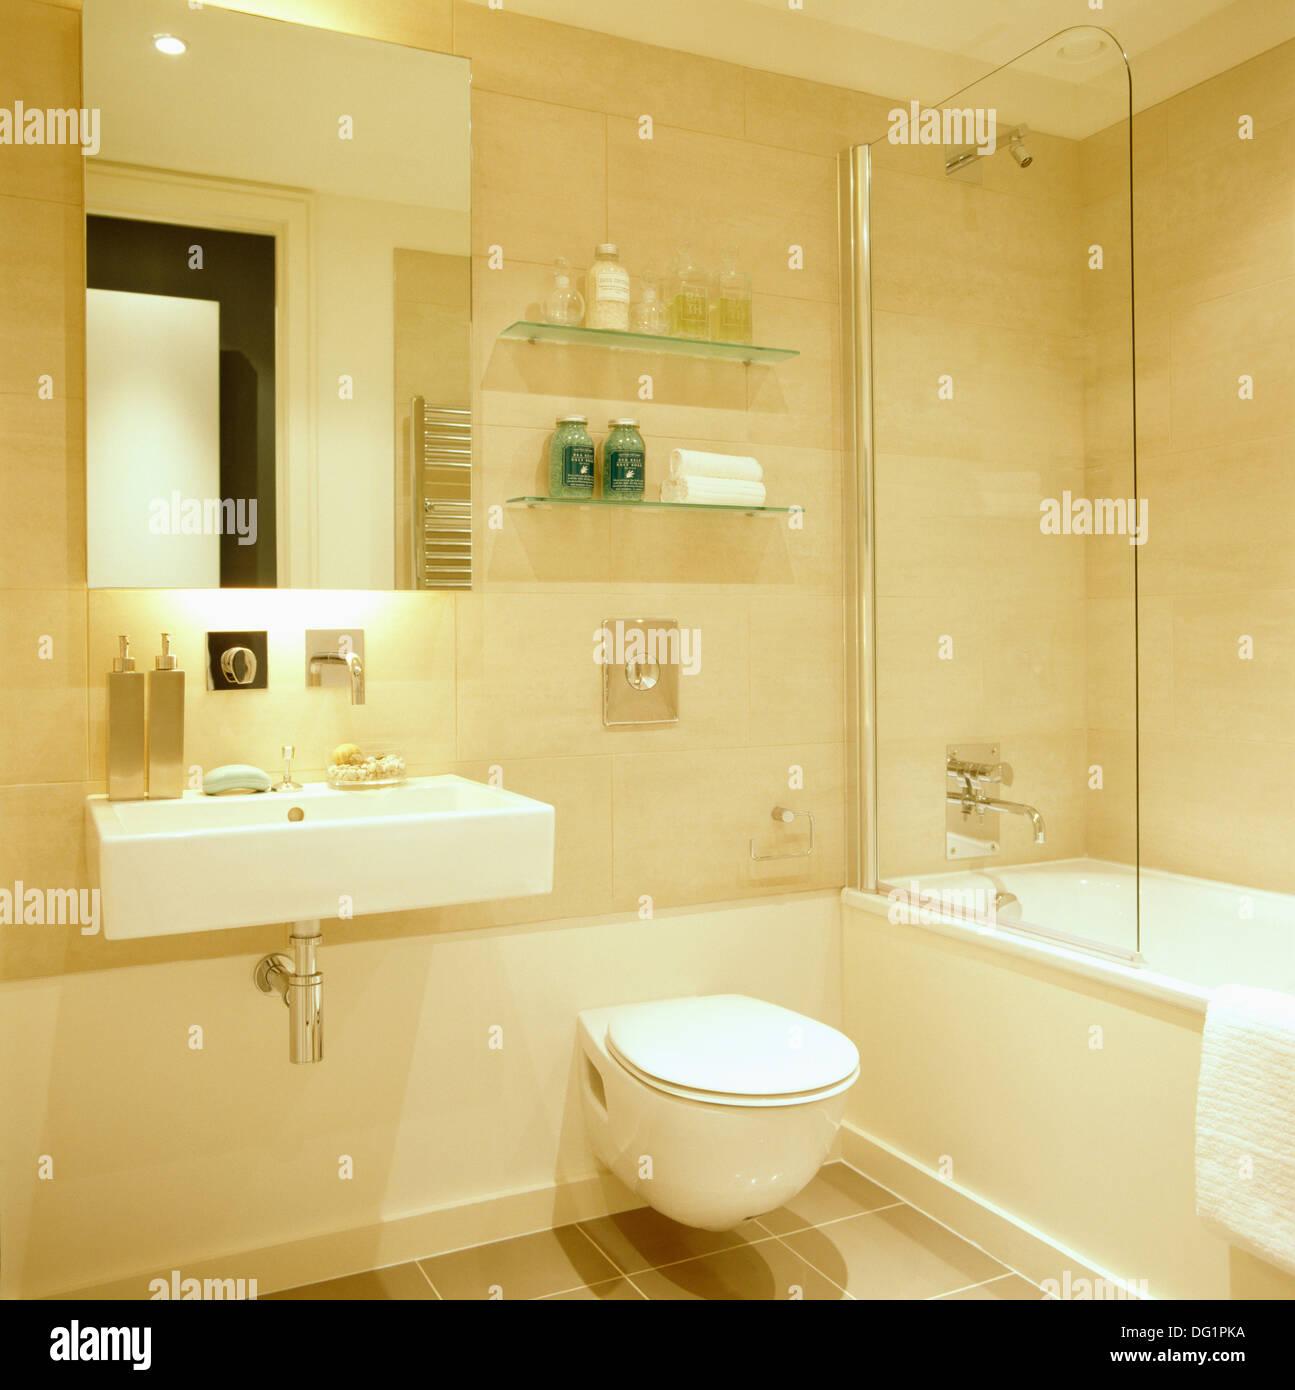 Mirror above rectangular basin in modern city bathroom with toilet ...